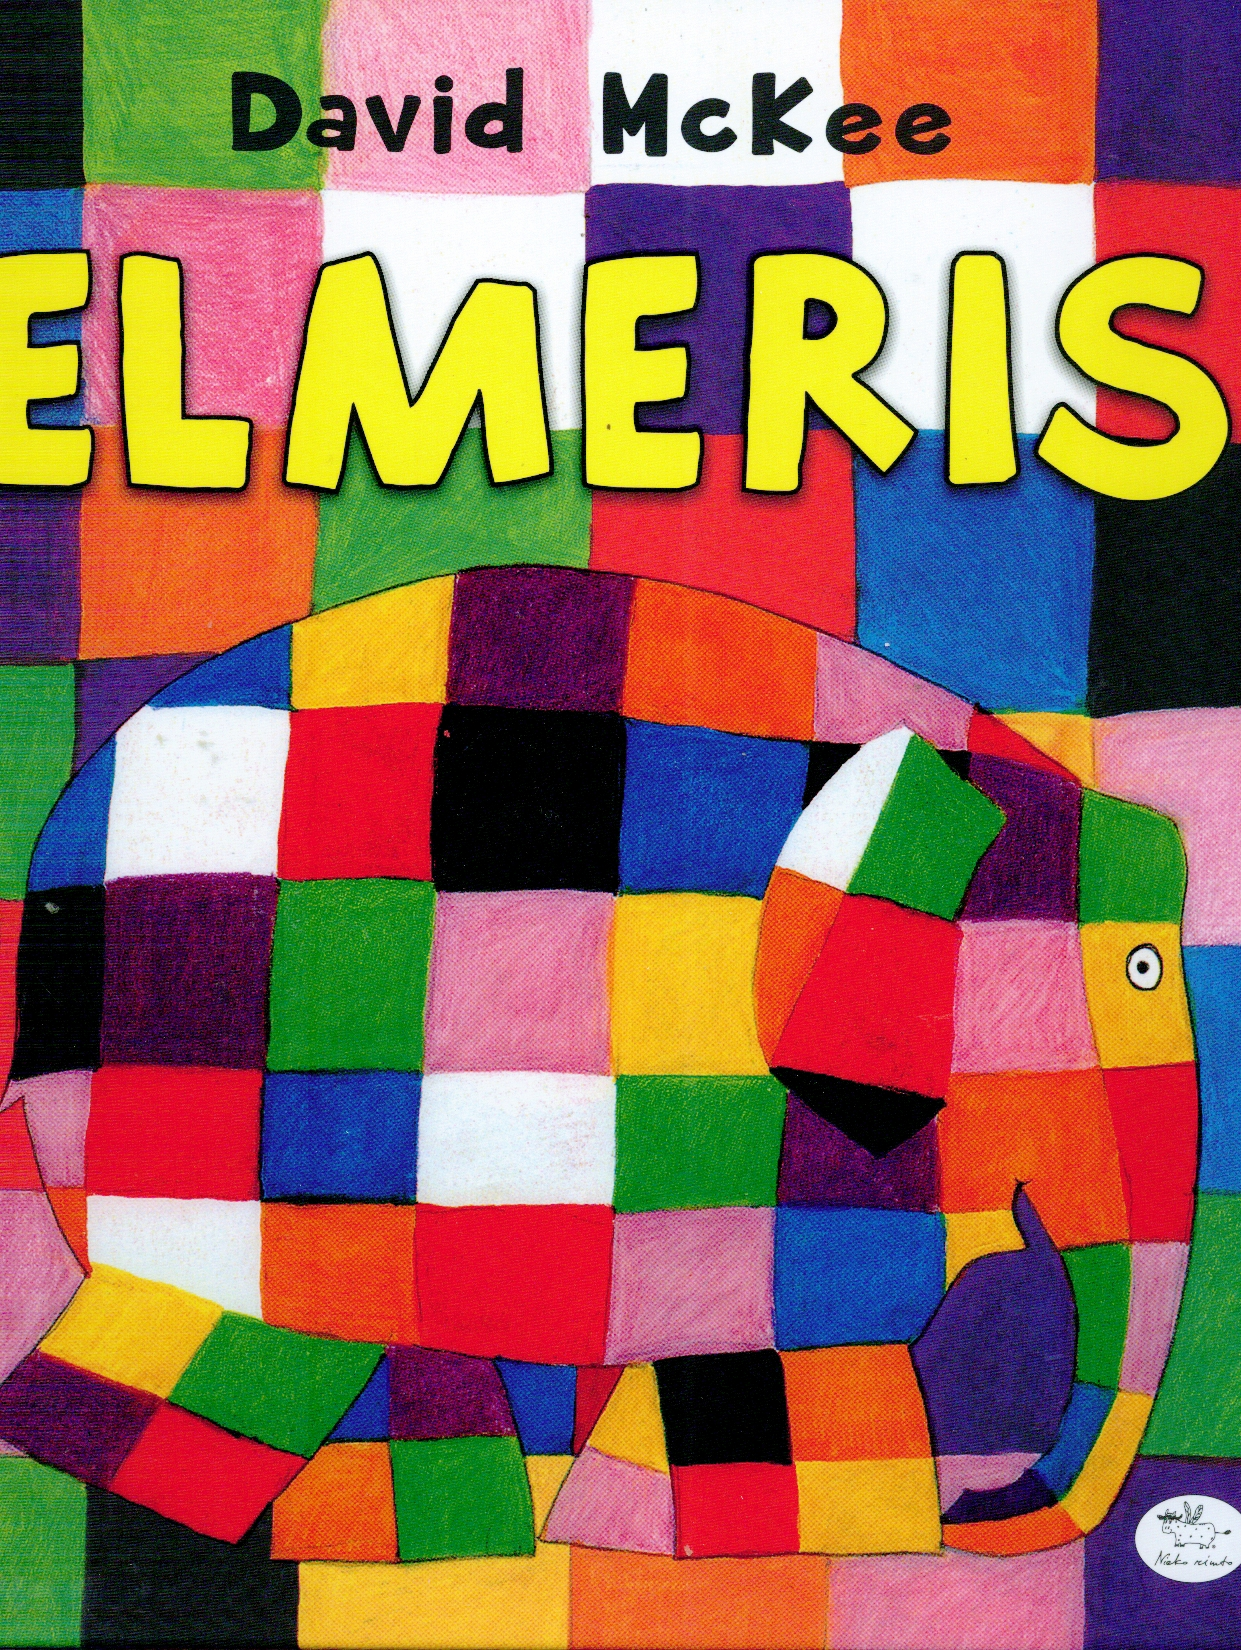 Elmeris